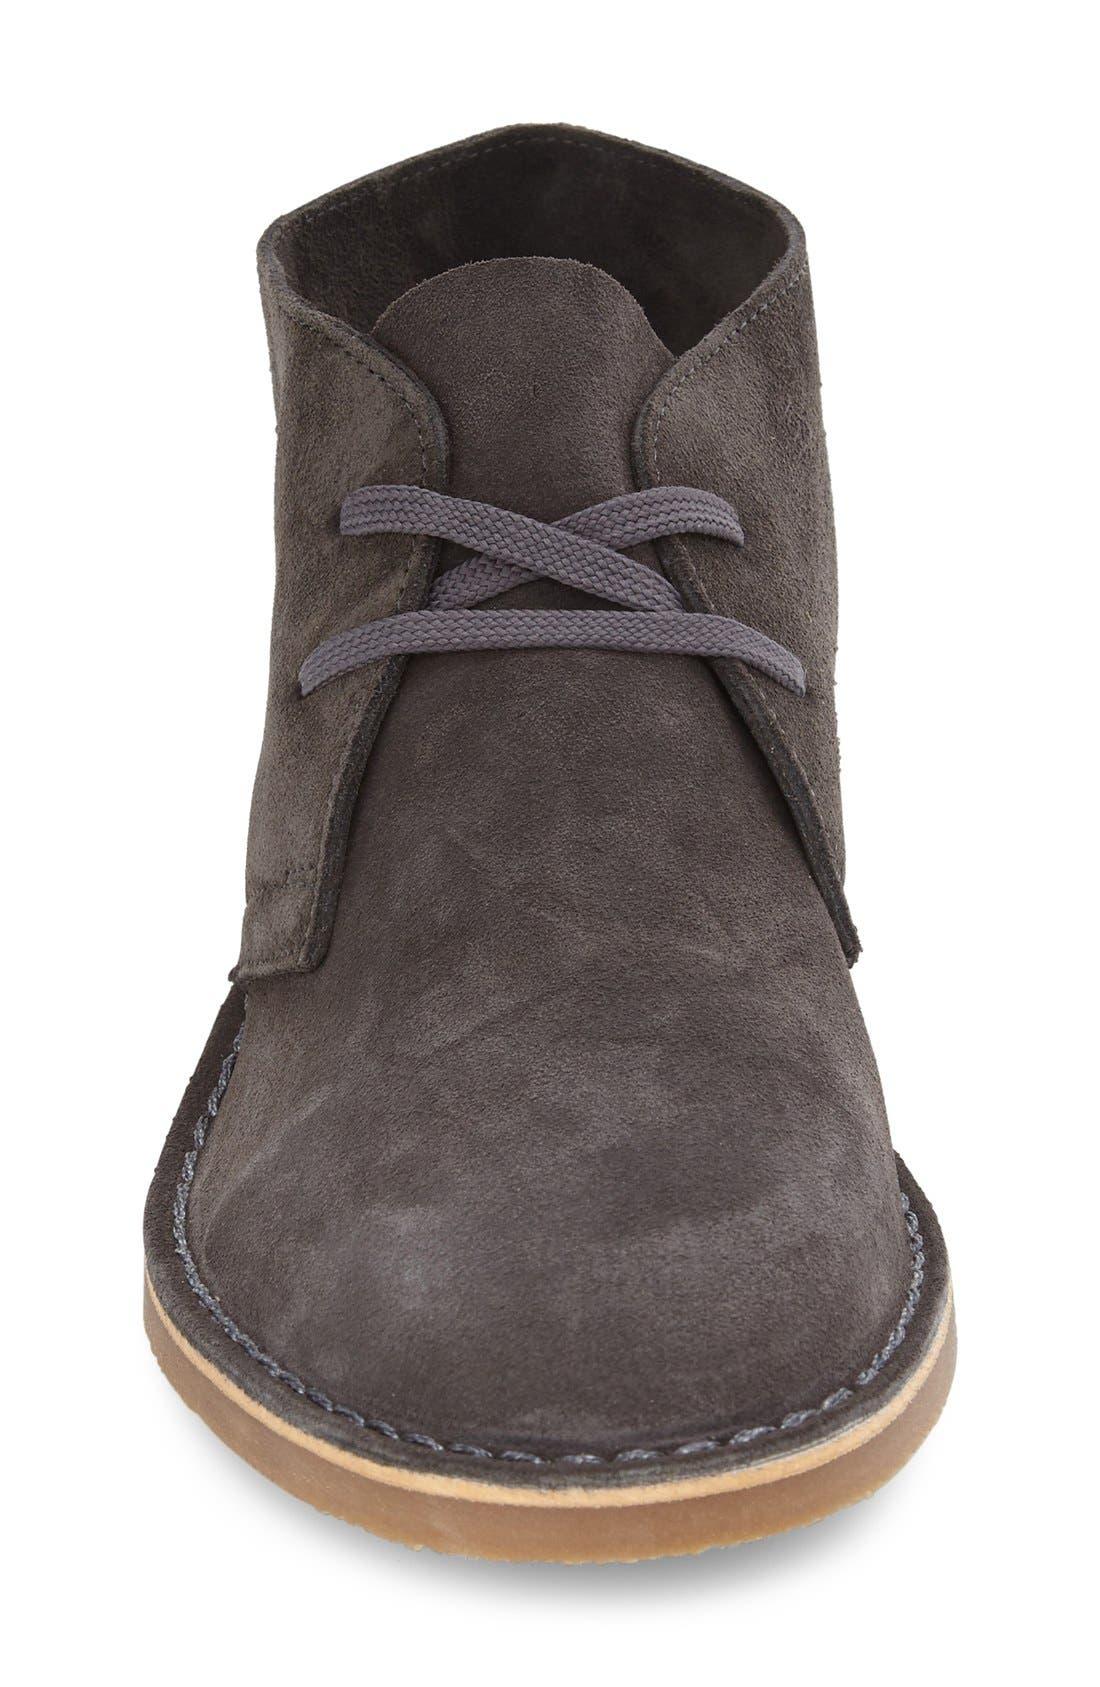 'Greyson' Chukka Boot,                             Alternate thumbnail 3, color,                             020